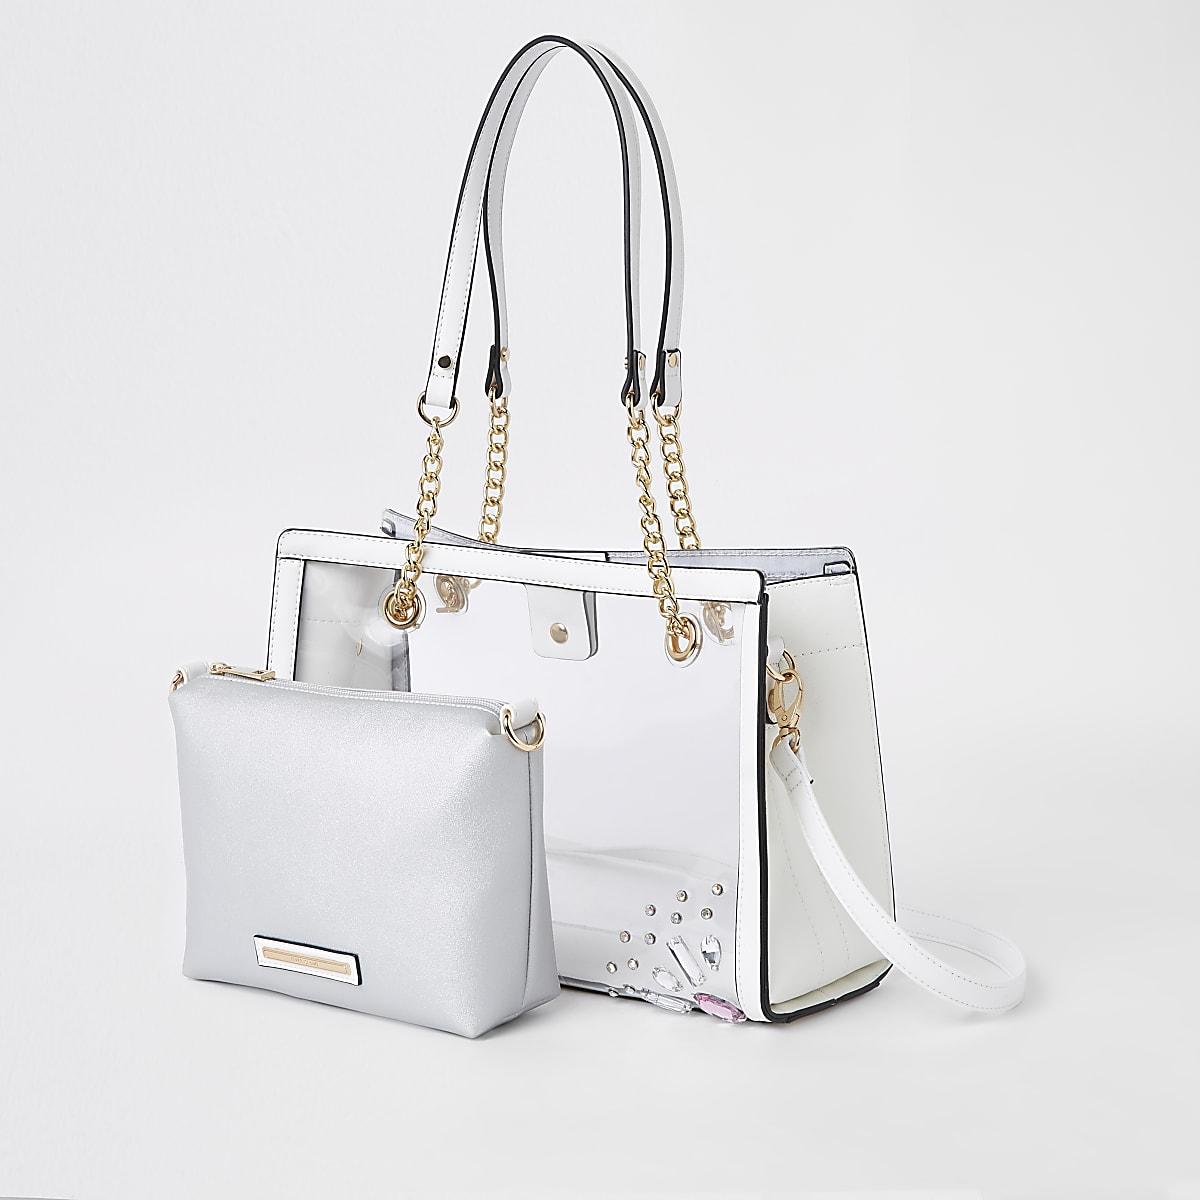 Witte perspex handtas met binnenvak